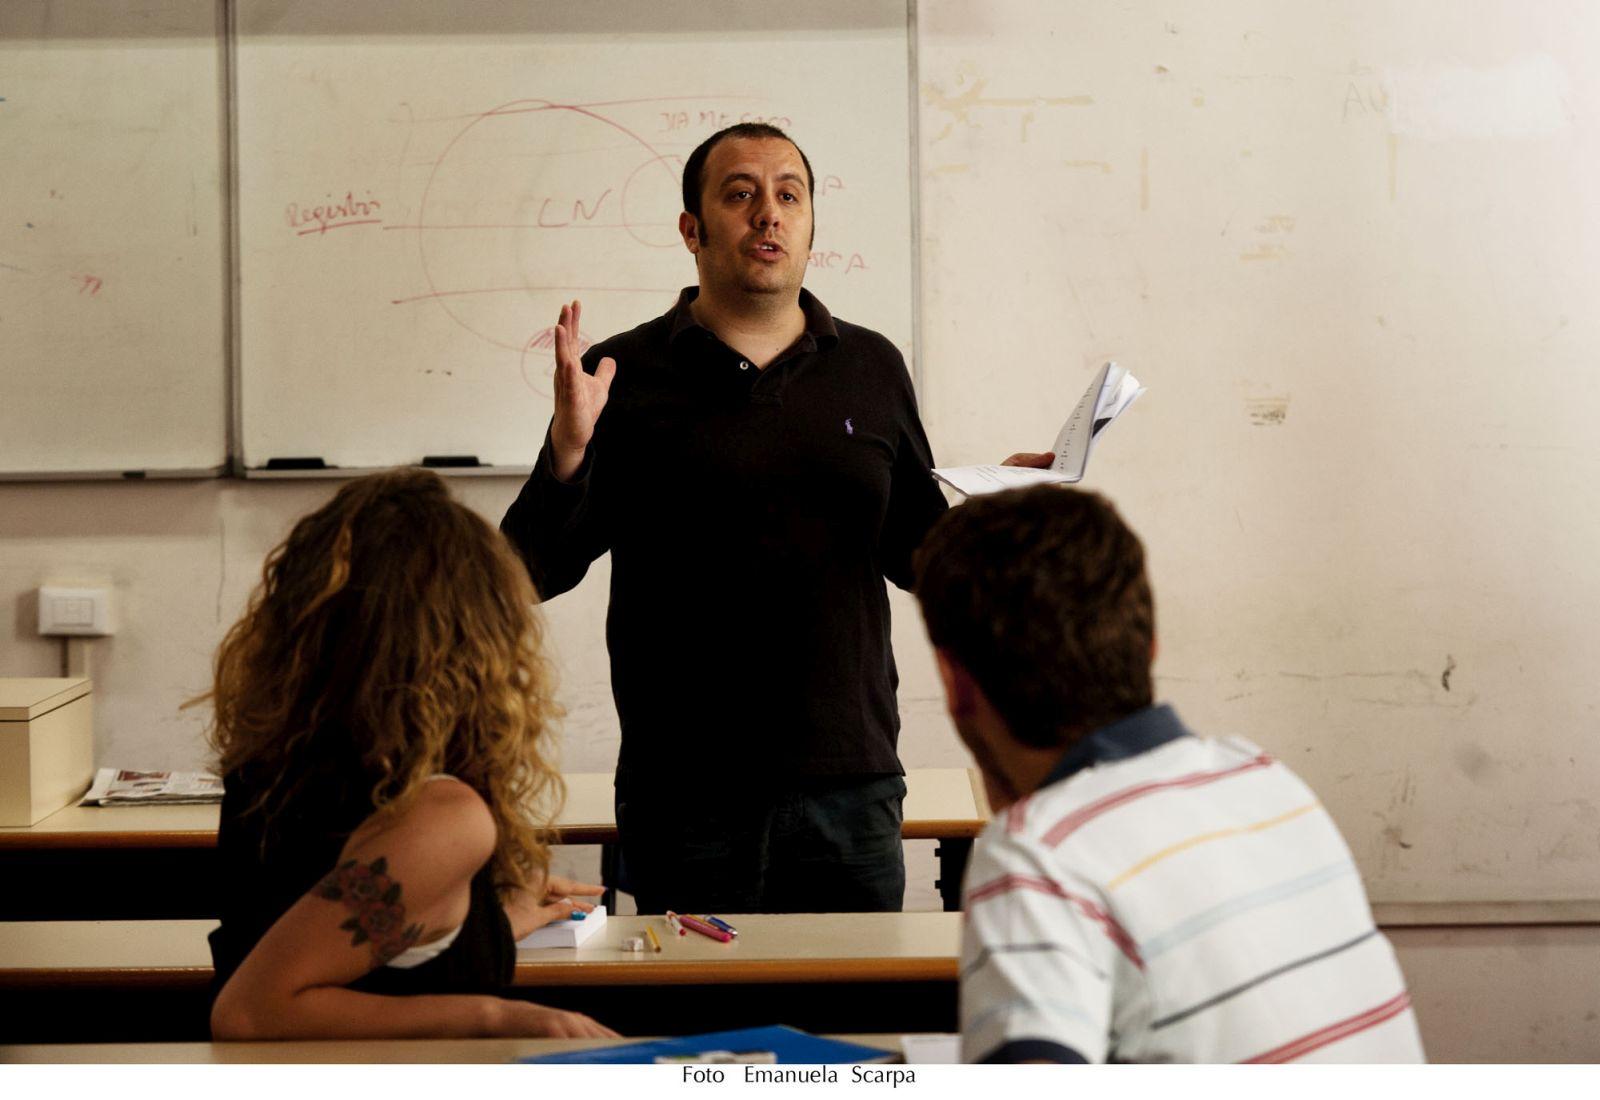 La nostra quarantena: il regista Peter Marcias al lavoro sul set del film